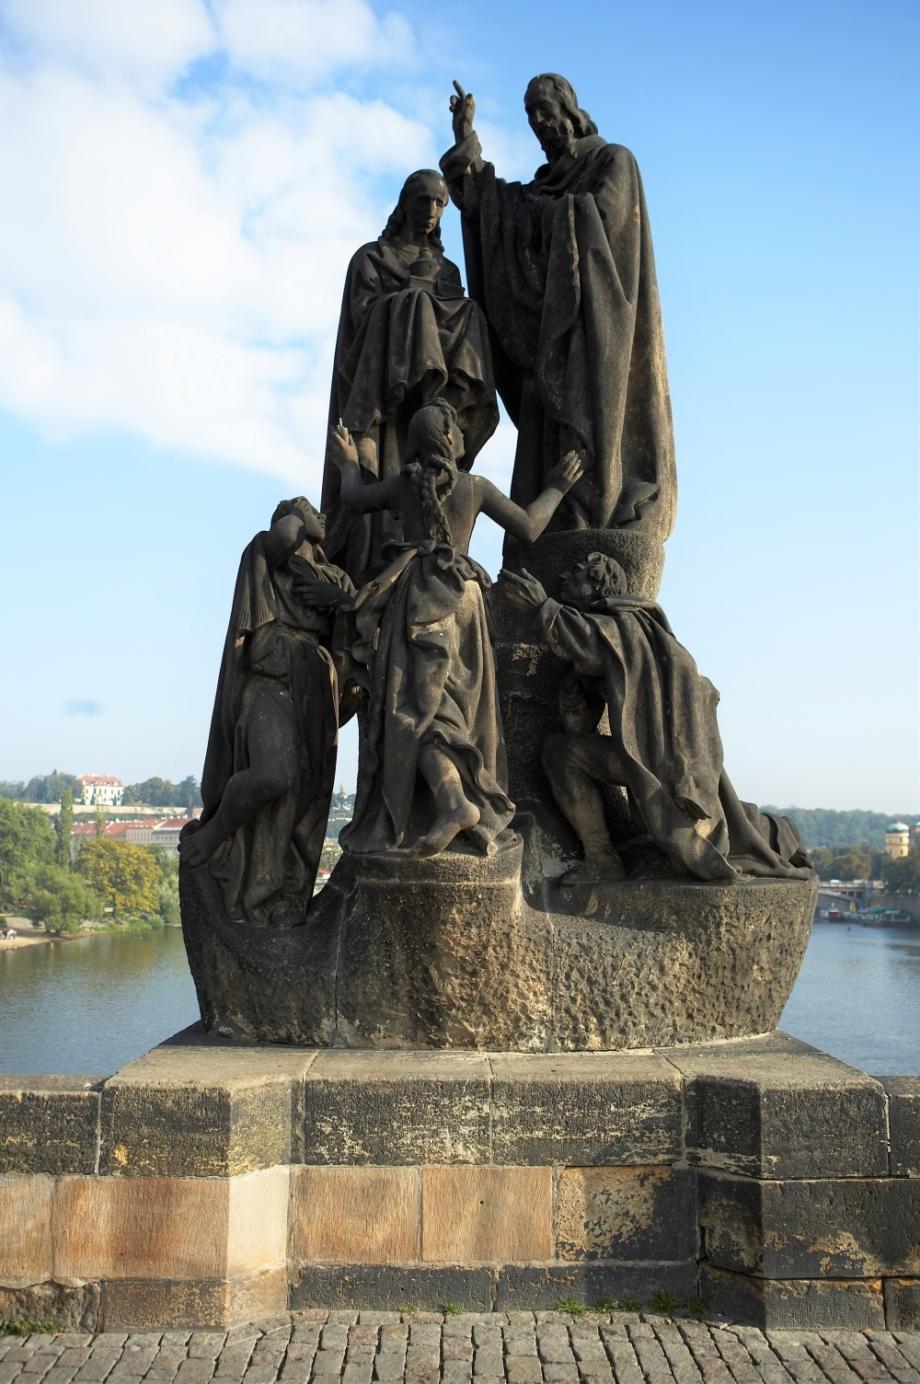 sculptural group of Cyril and Methodius – before restoration, Charles Bridge